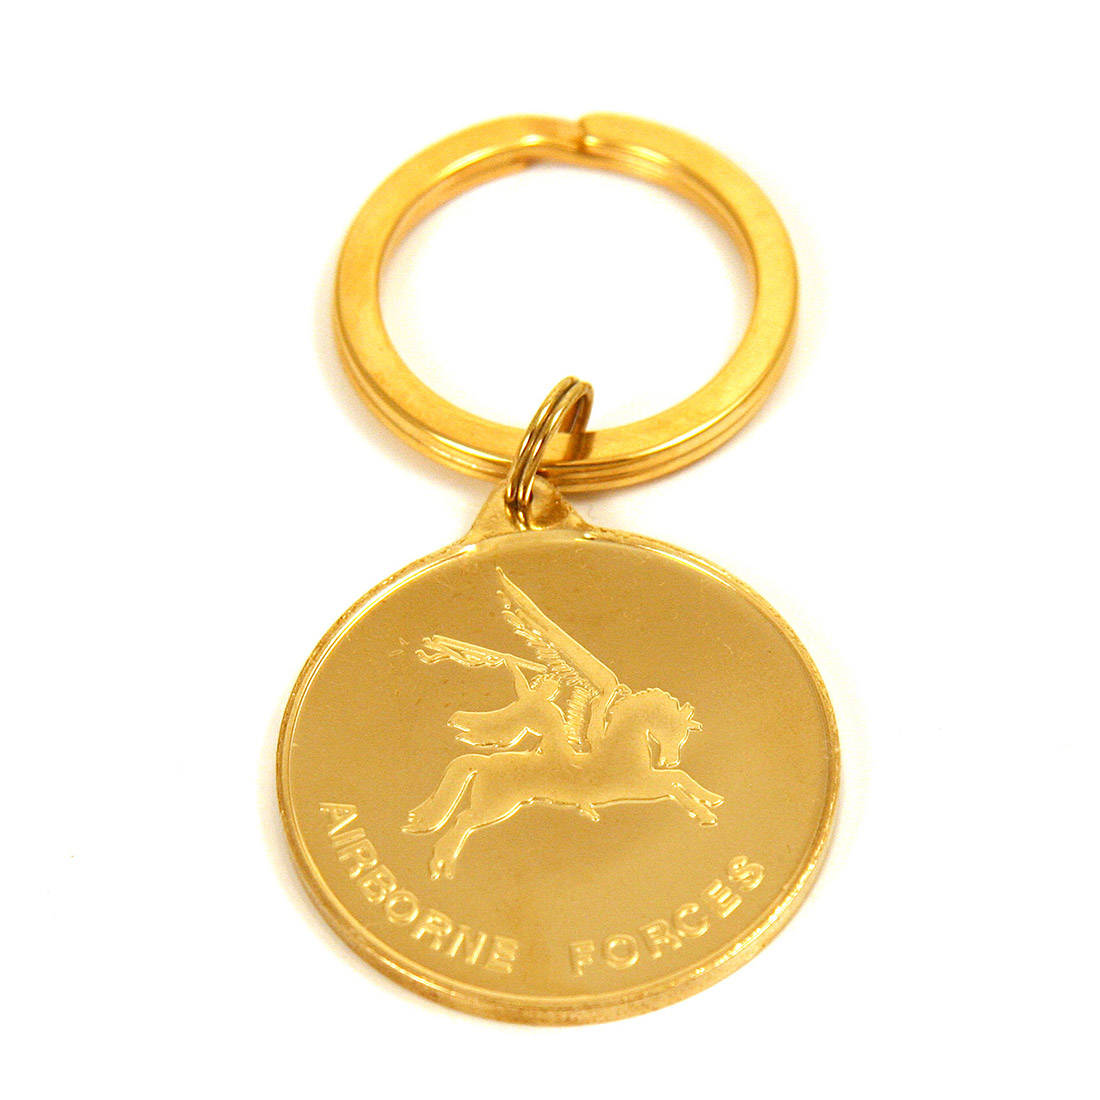 Medallion Key Ring, Parachute Regiment & Pegasus 22ct Gold